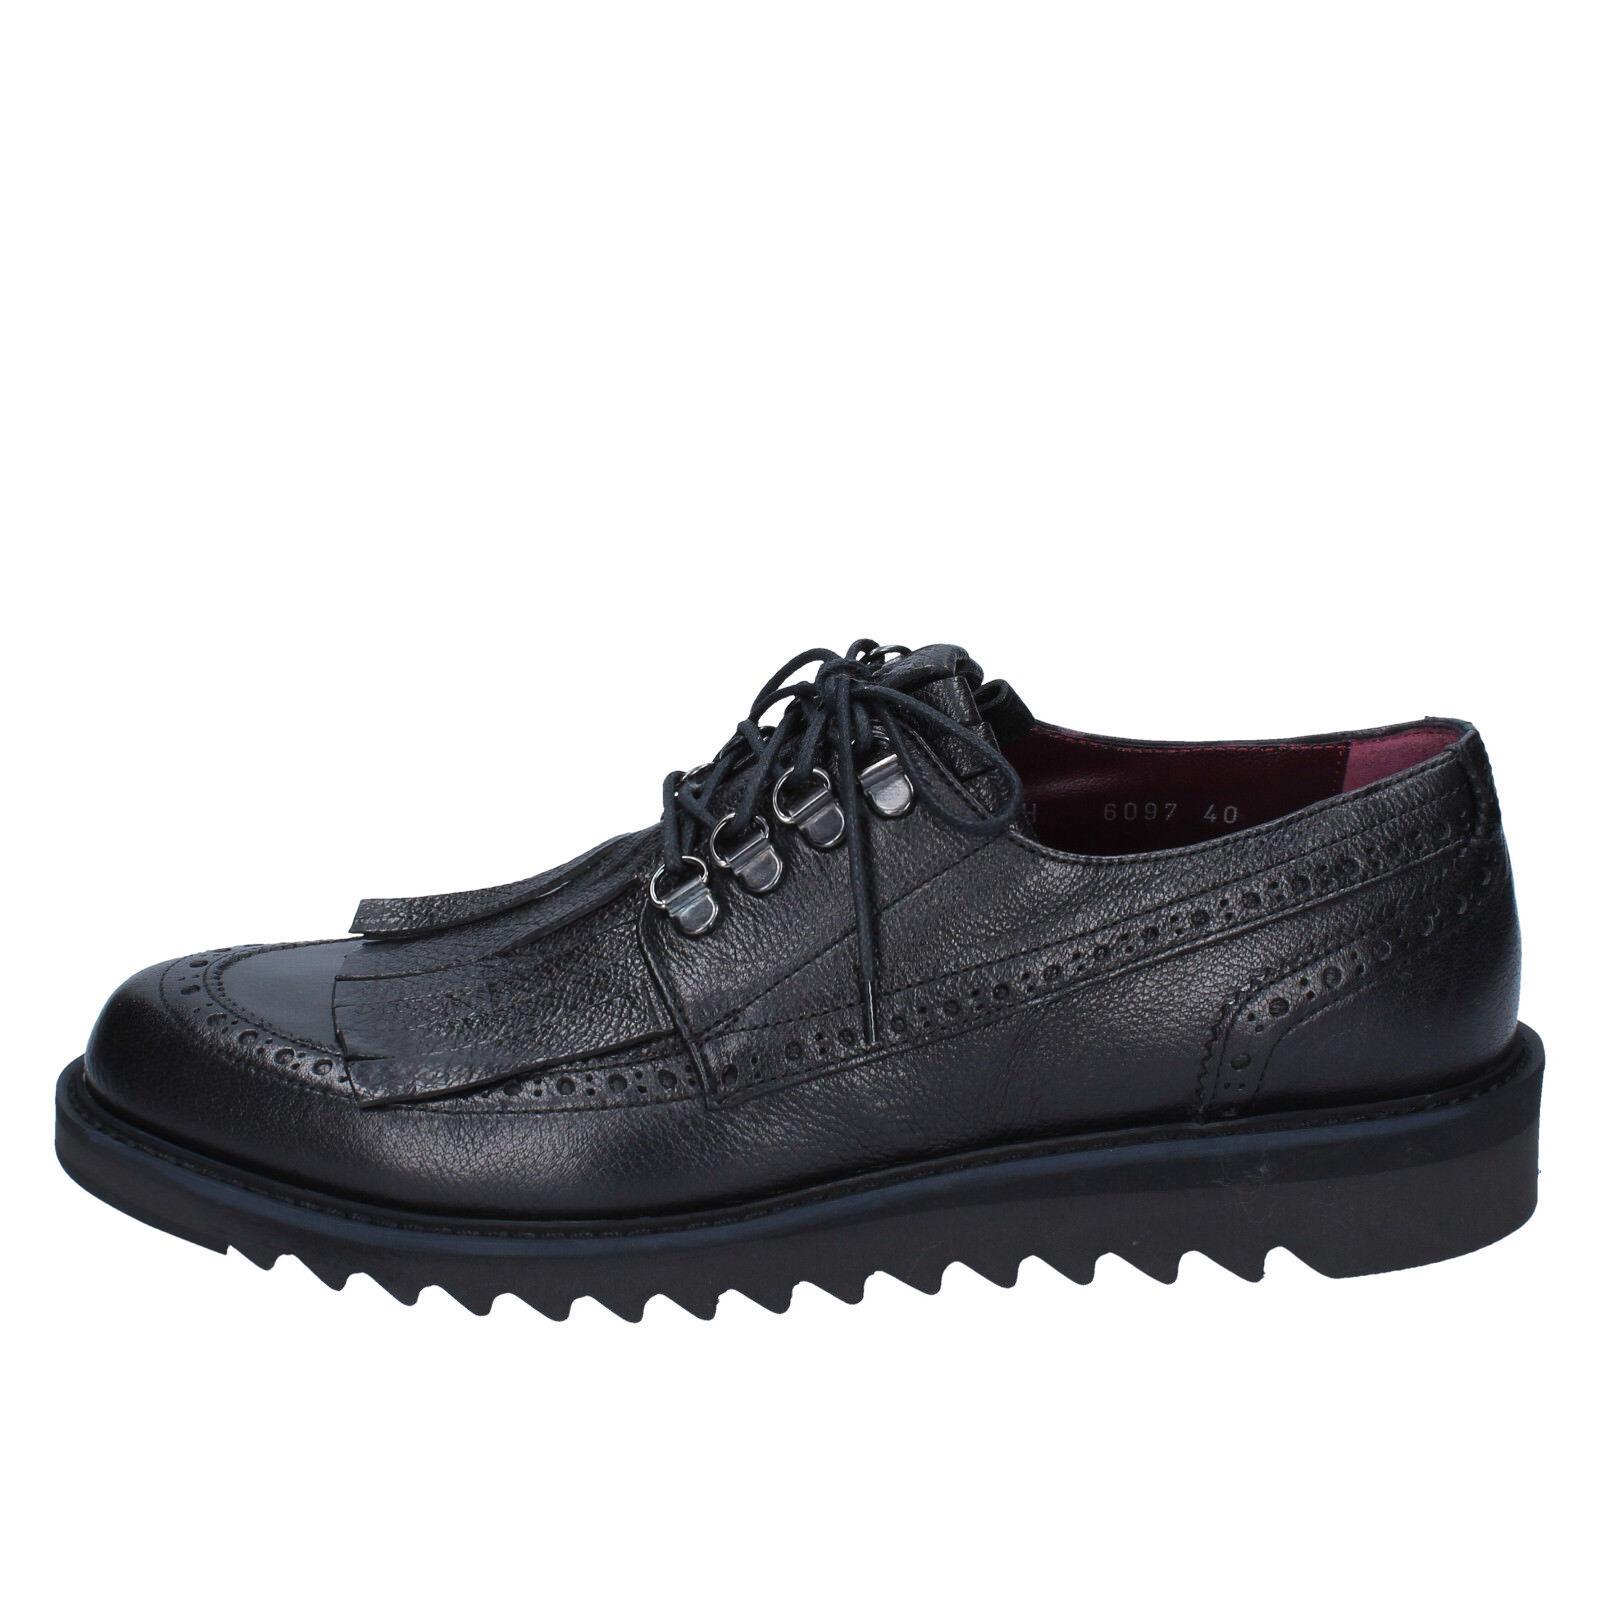 men's shoes ROBERTO BOTTICELLI 10 () elegant black leather BY585-43